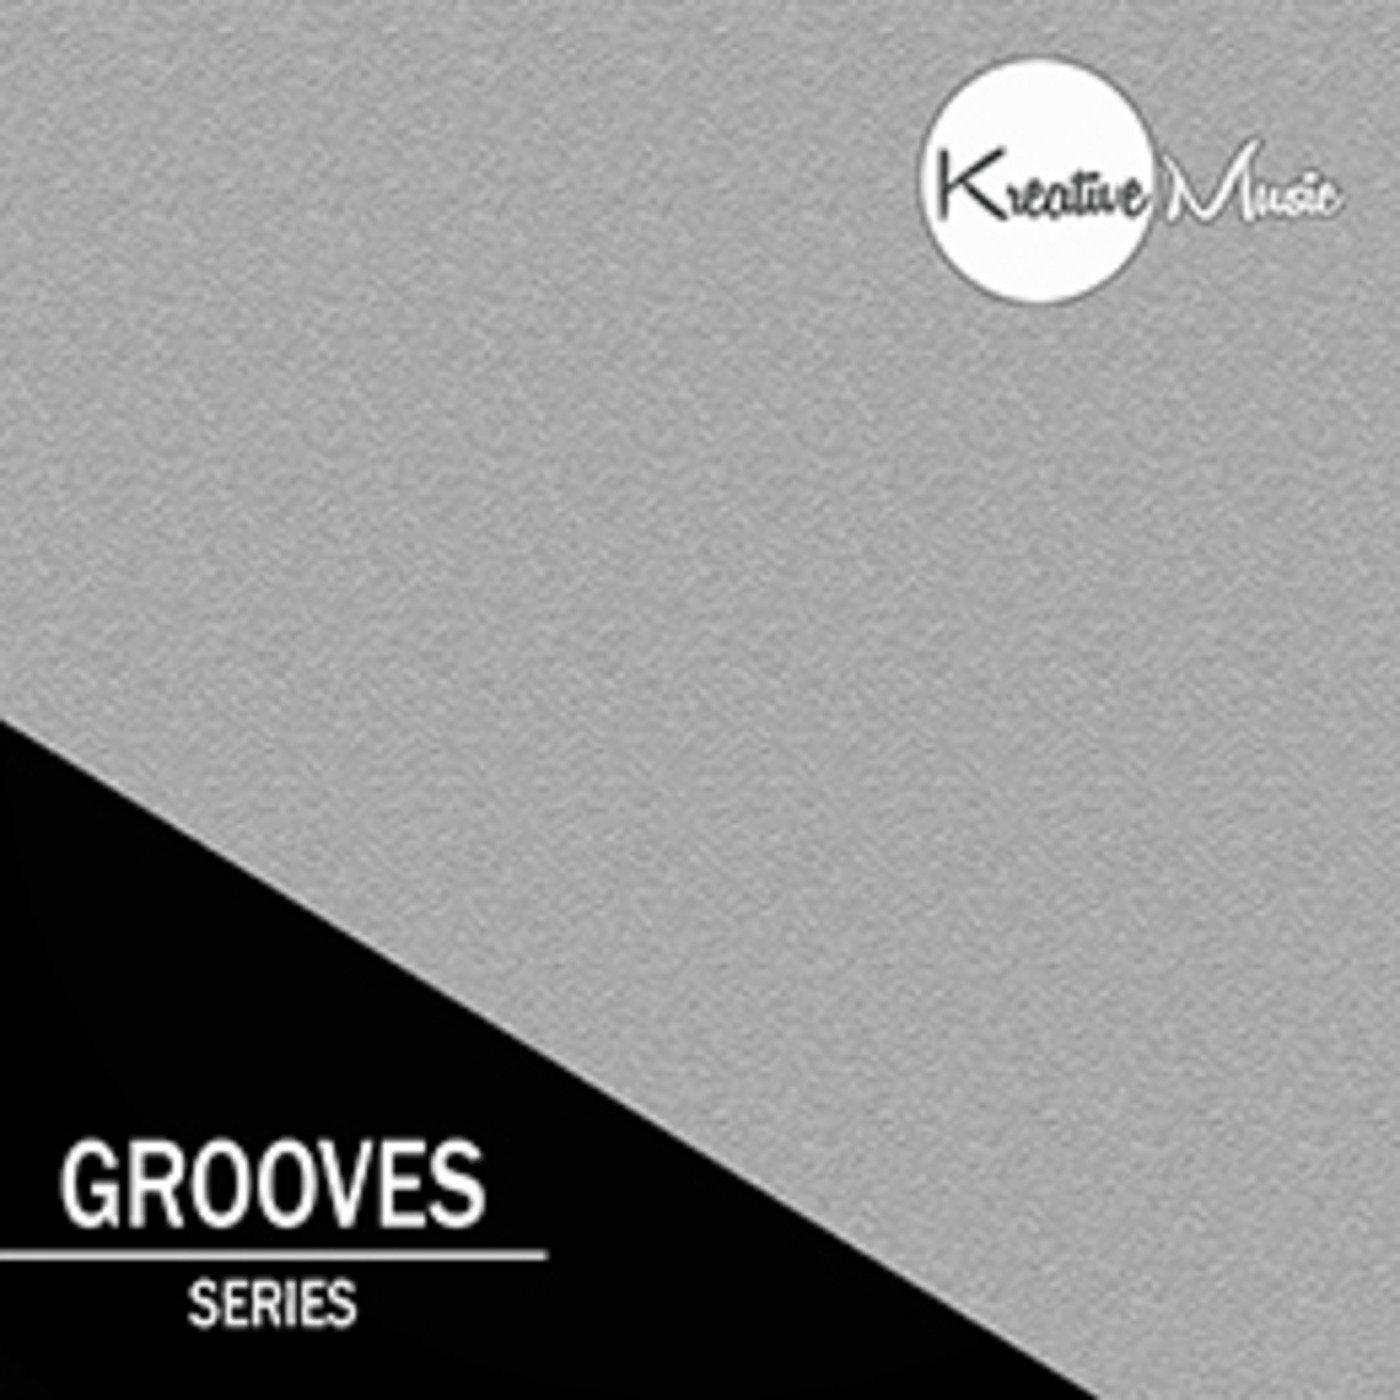 <![CDATA[001 Grooves by Huakim Eloyuwon]]>